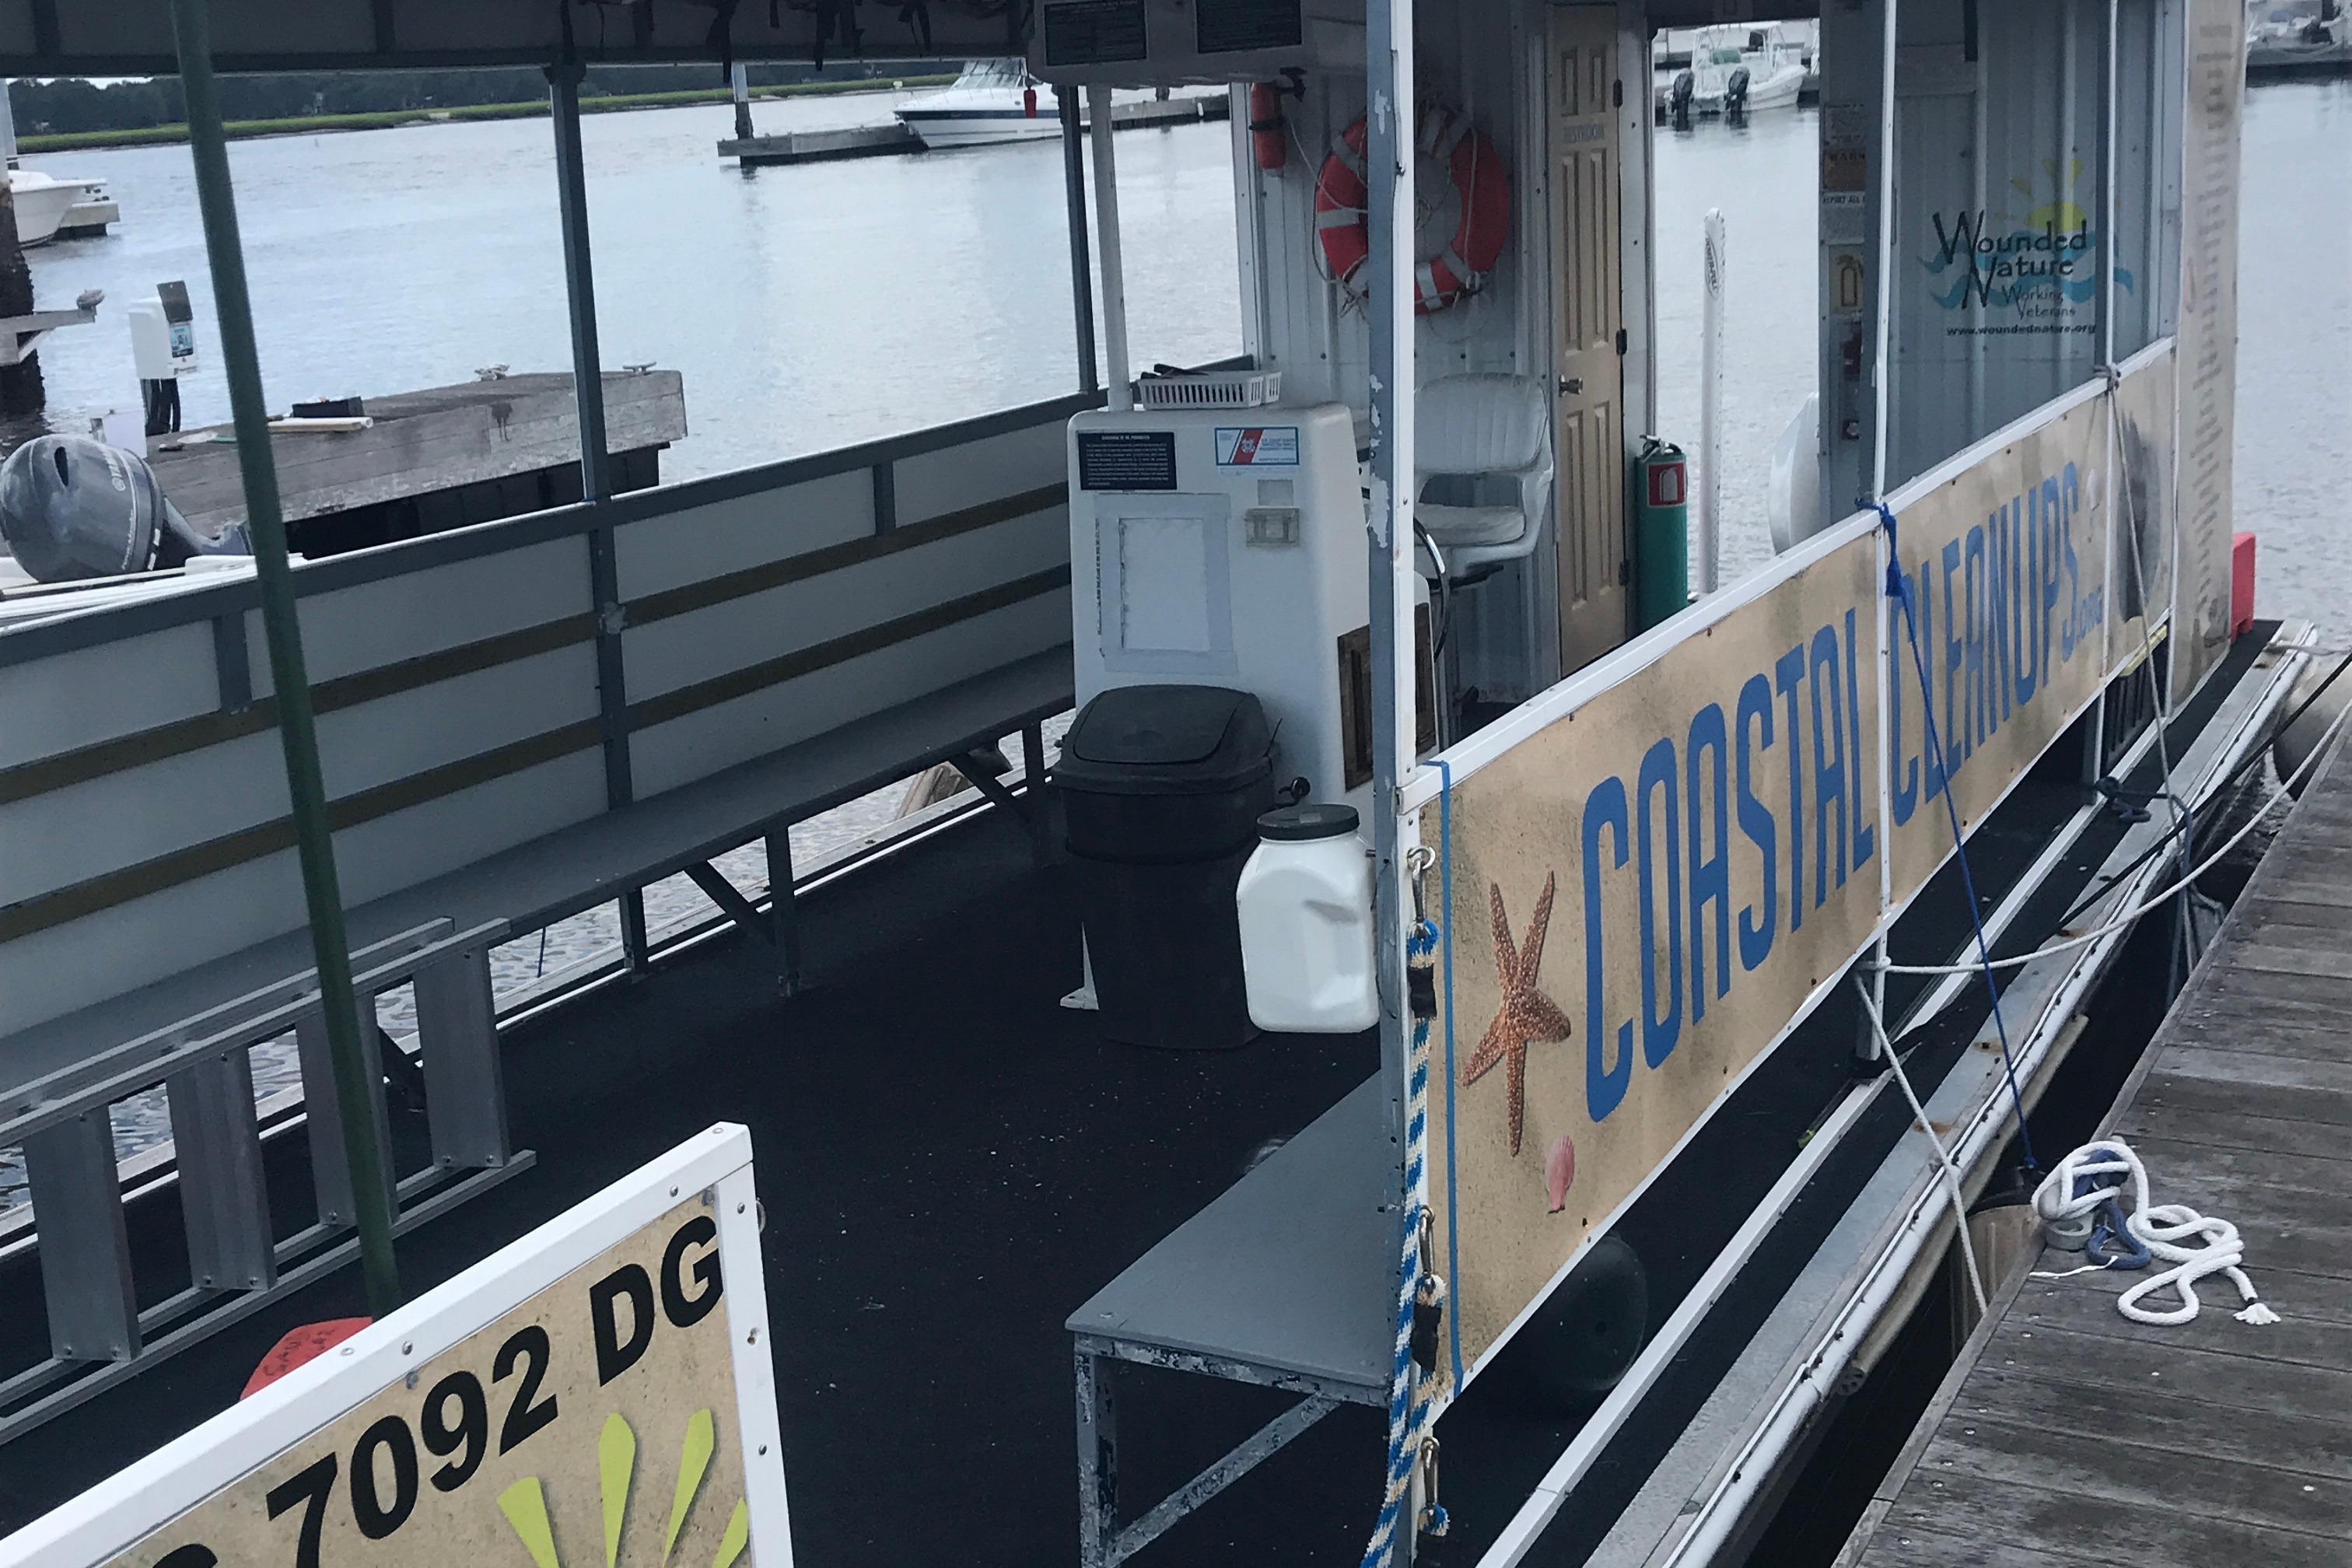 Southern Star 32 Commerical Catamaran - Port side boarding gate